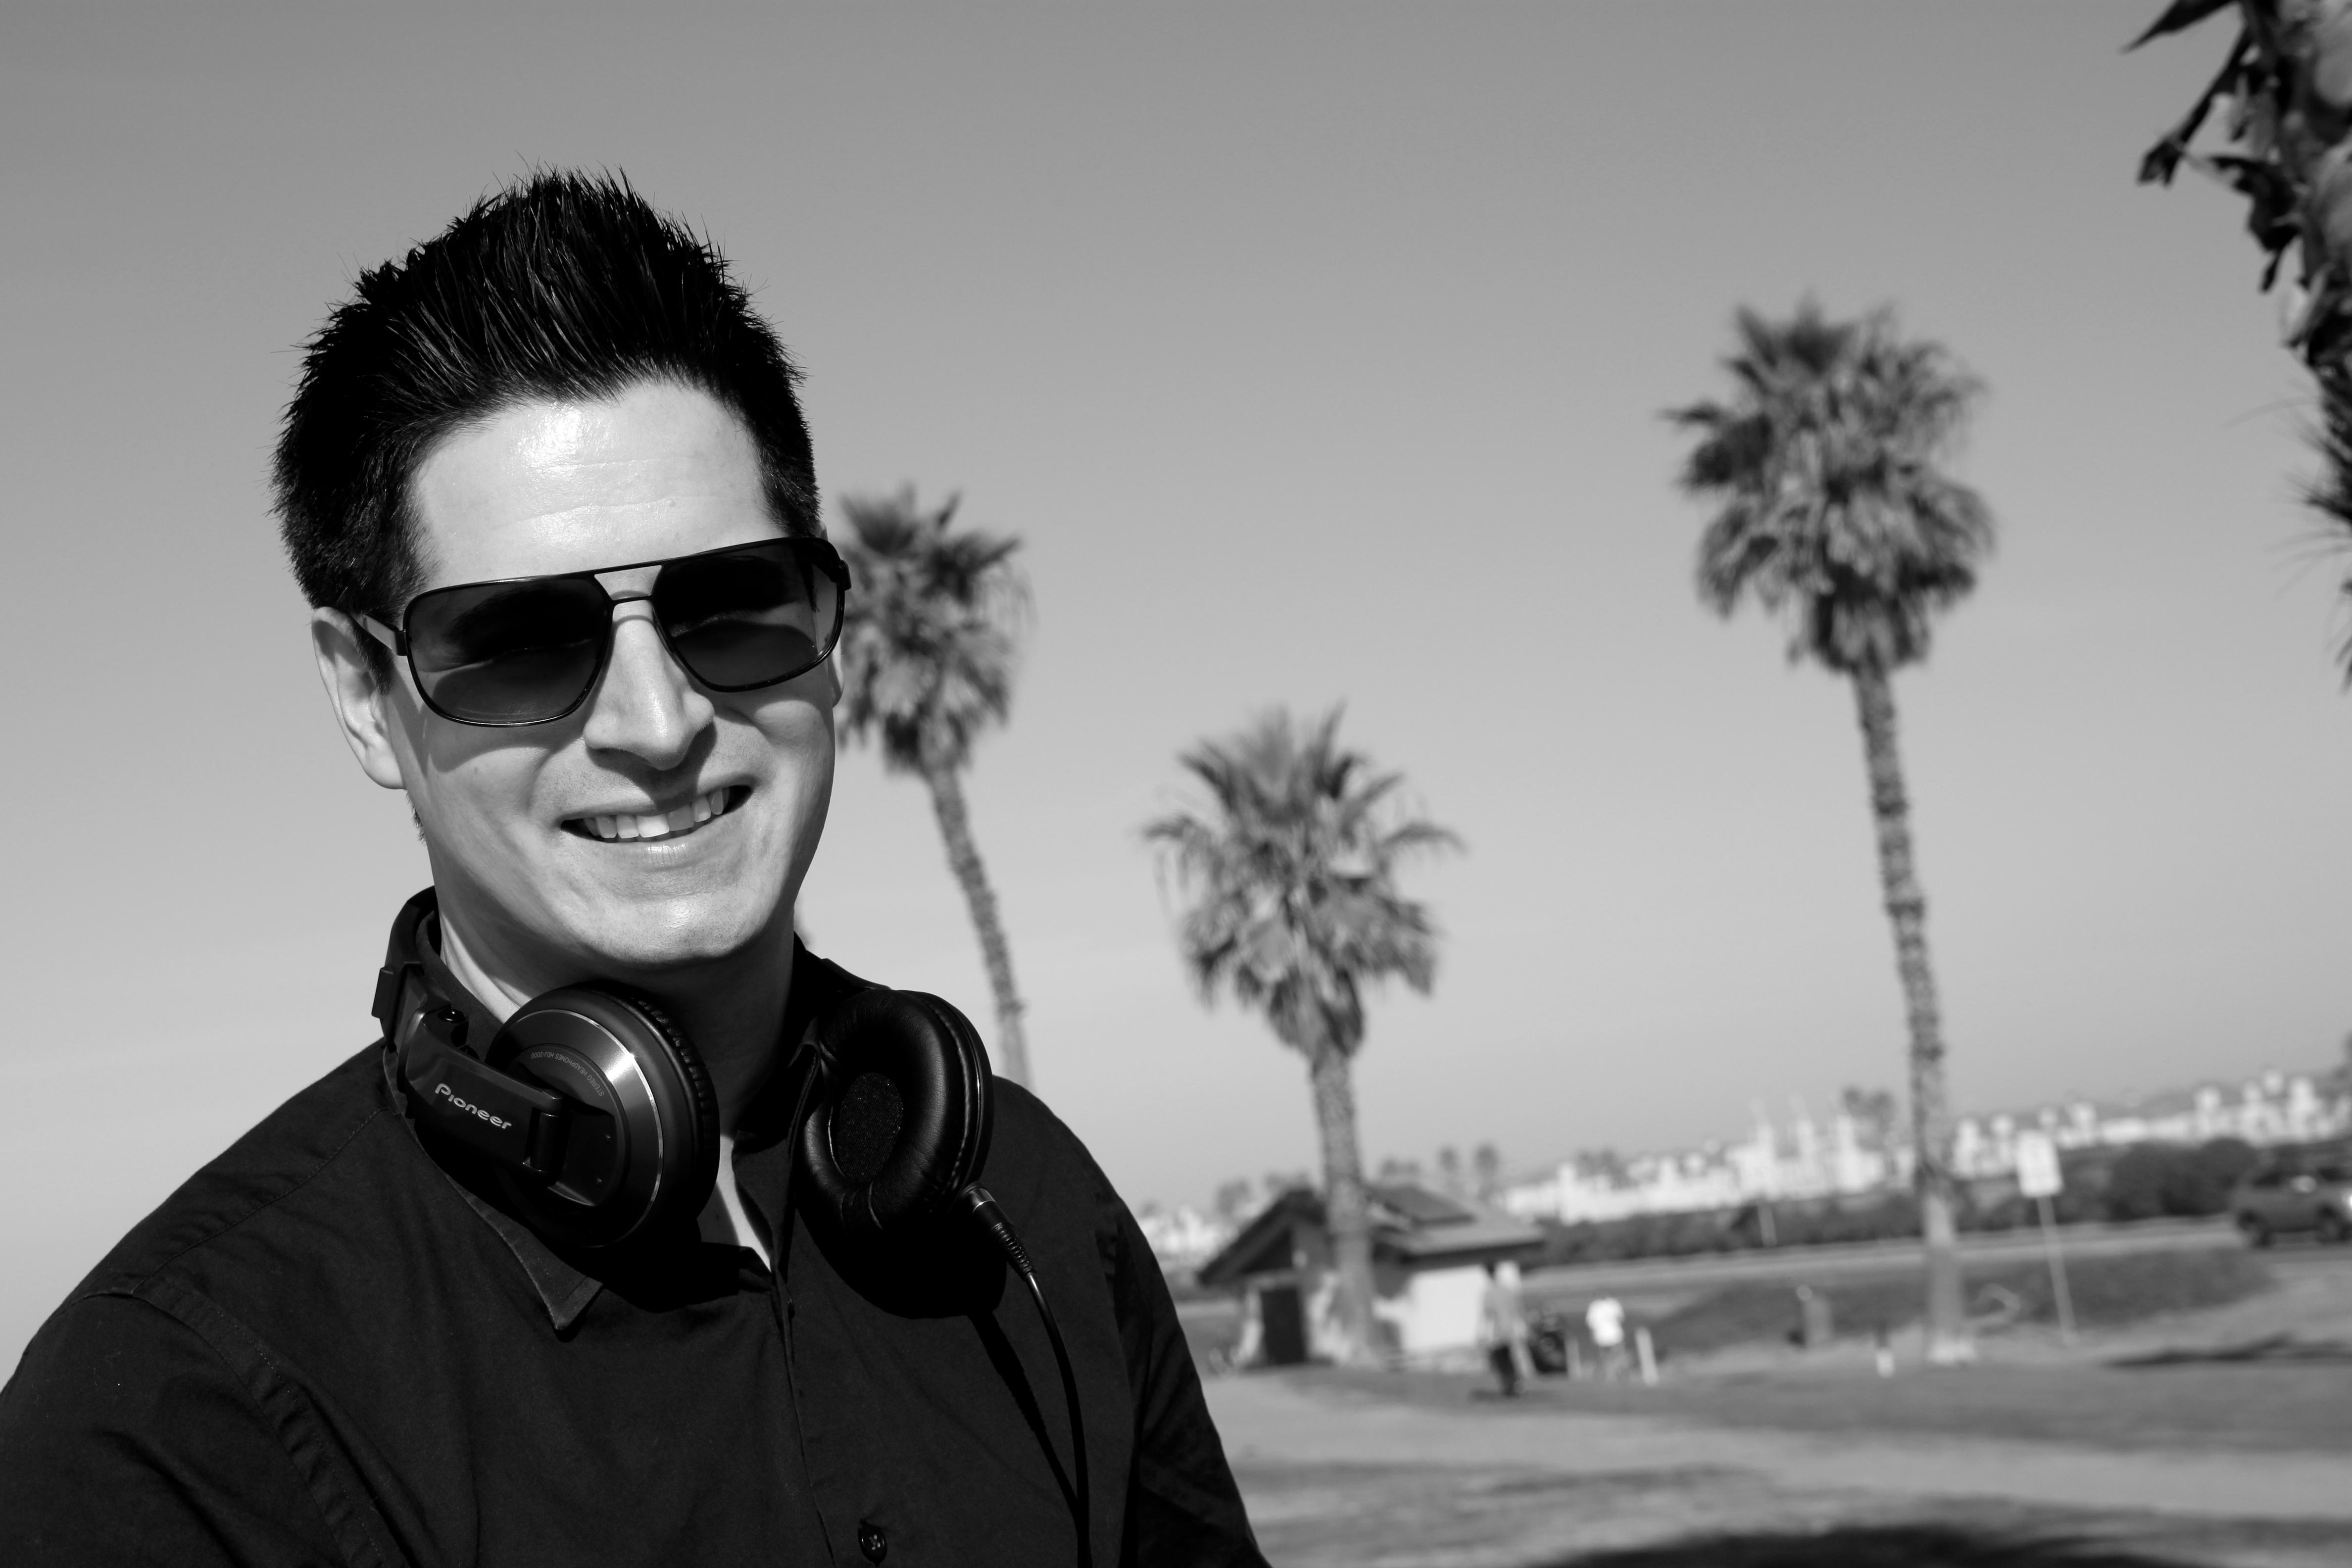 Jarret Holdridge - DJ J Roc